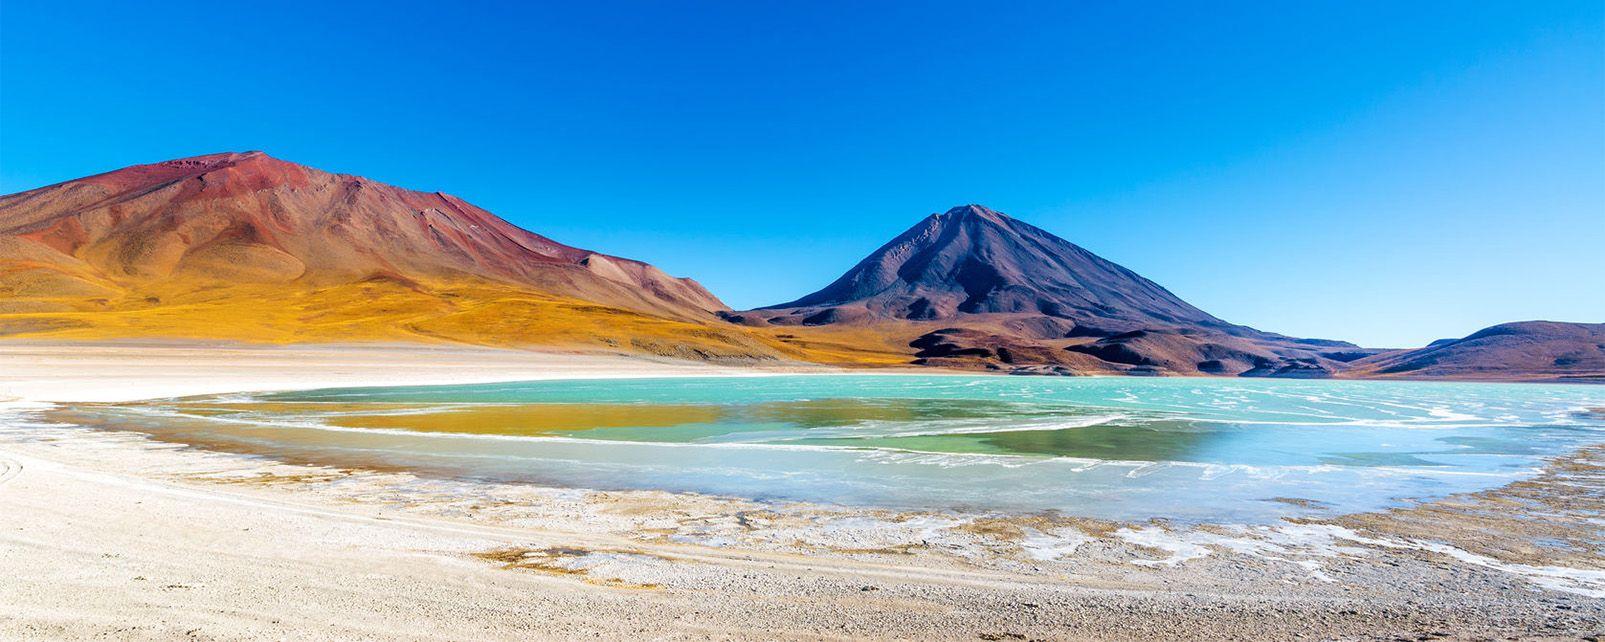 Laguna Verde (Green Lagoon) , Bolivia